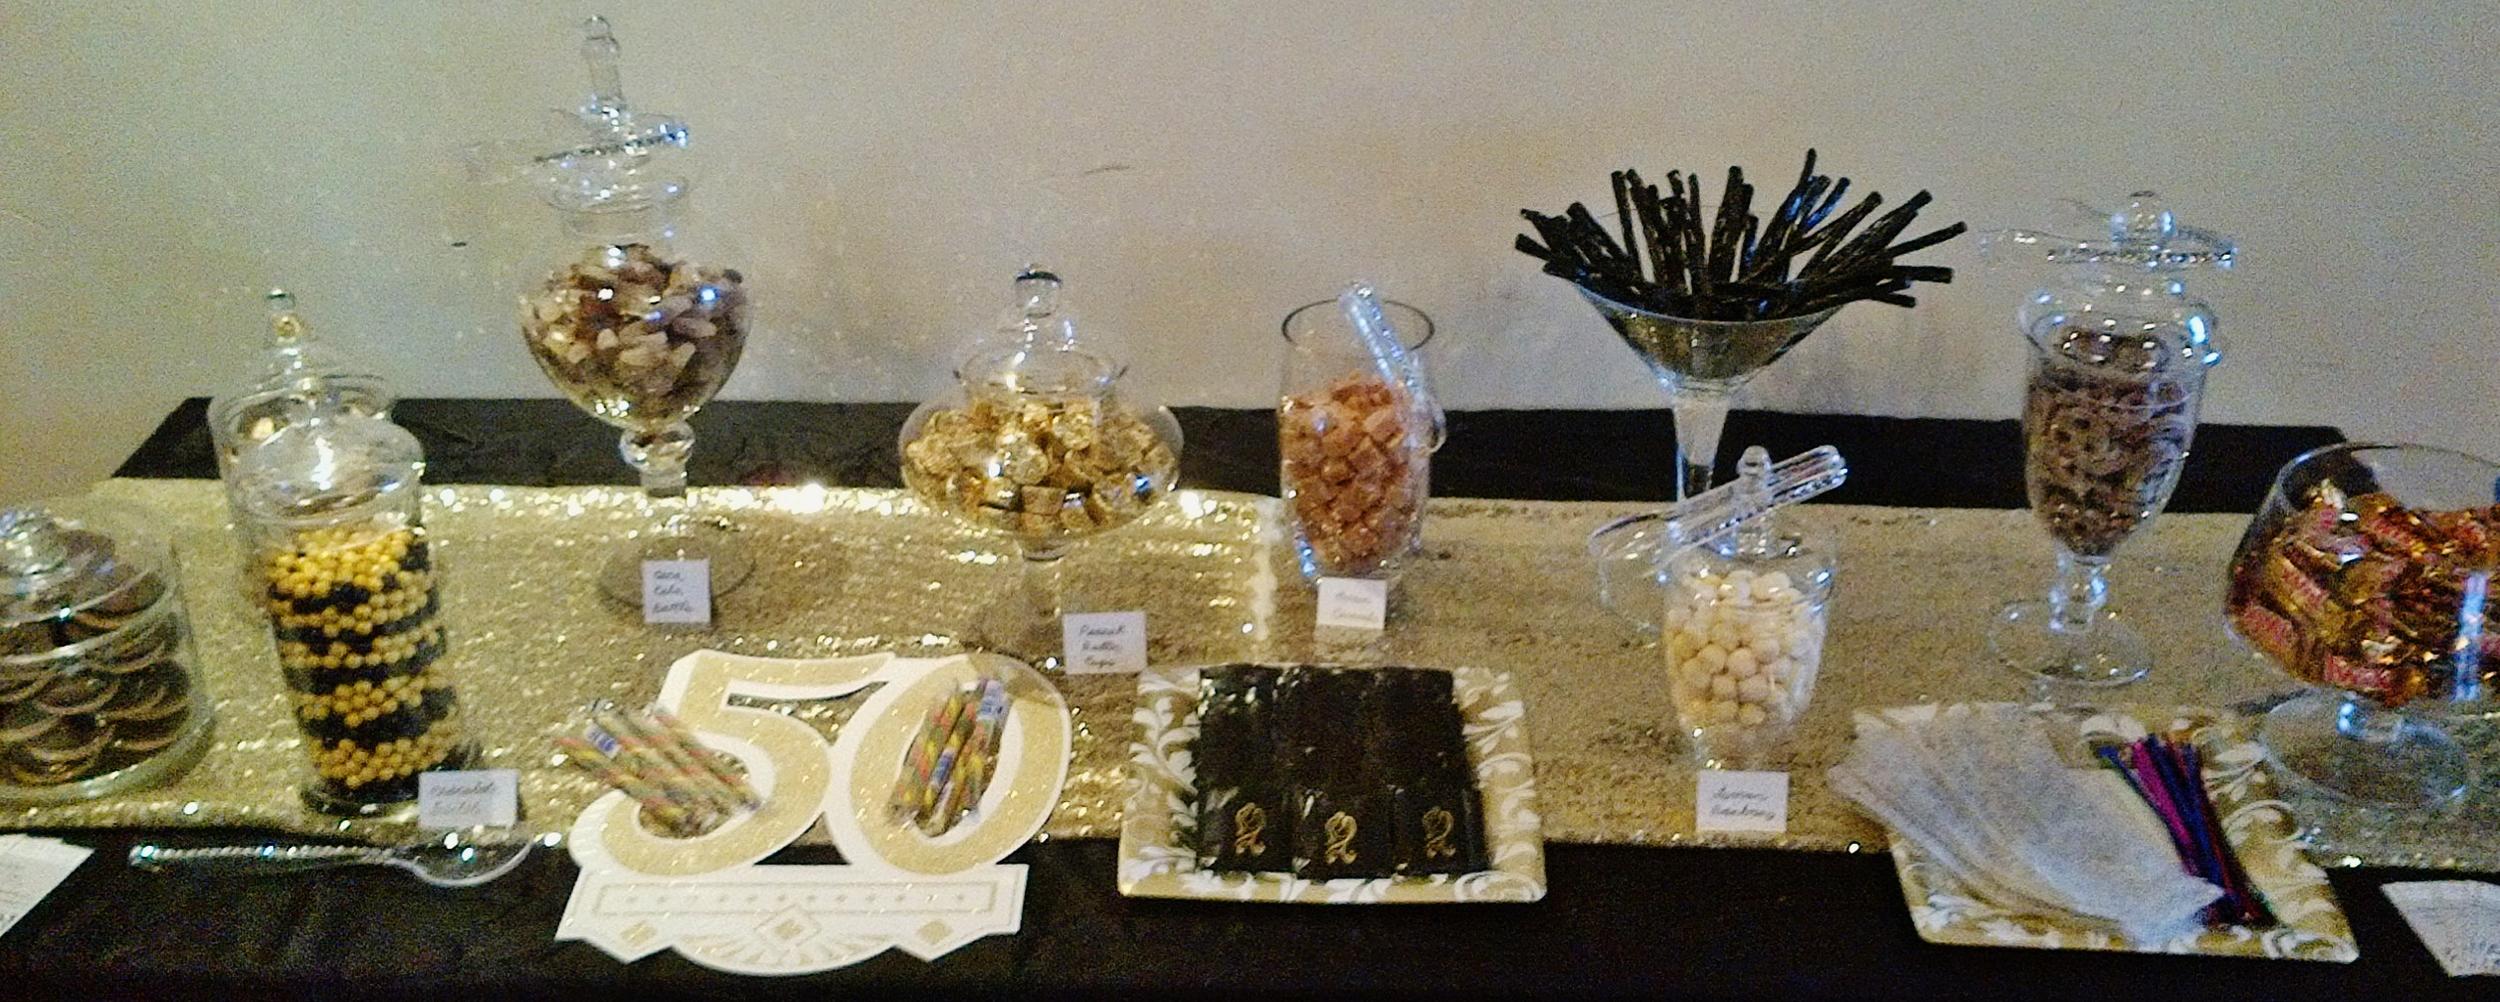 50th Candy Buffet.jpg